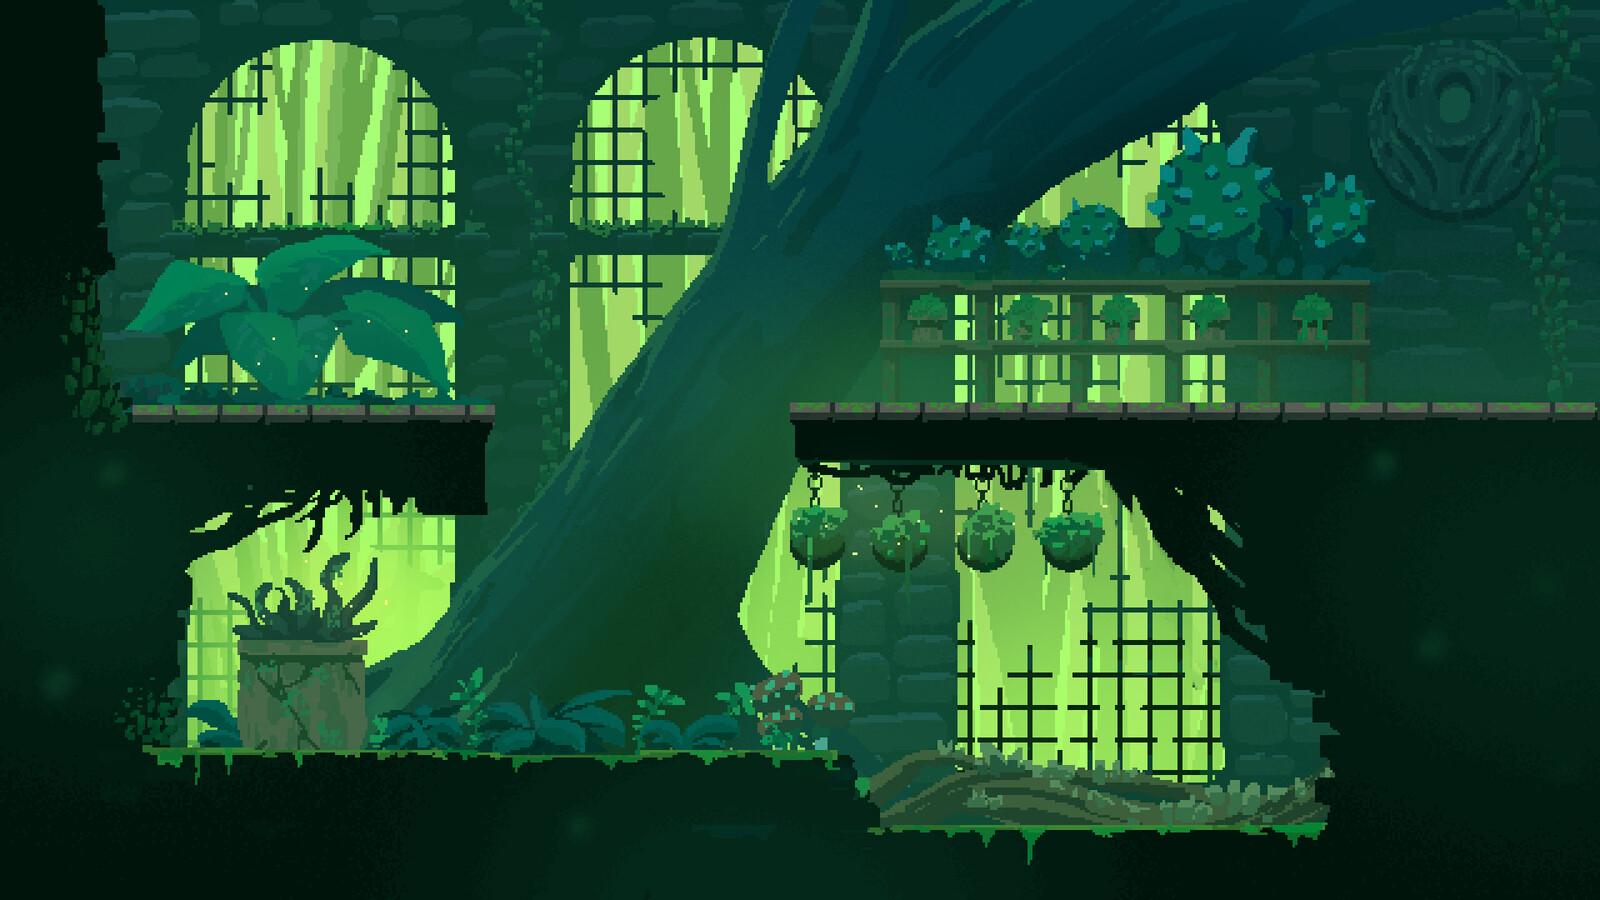 greenhouse environment